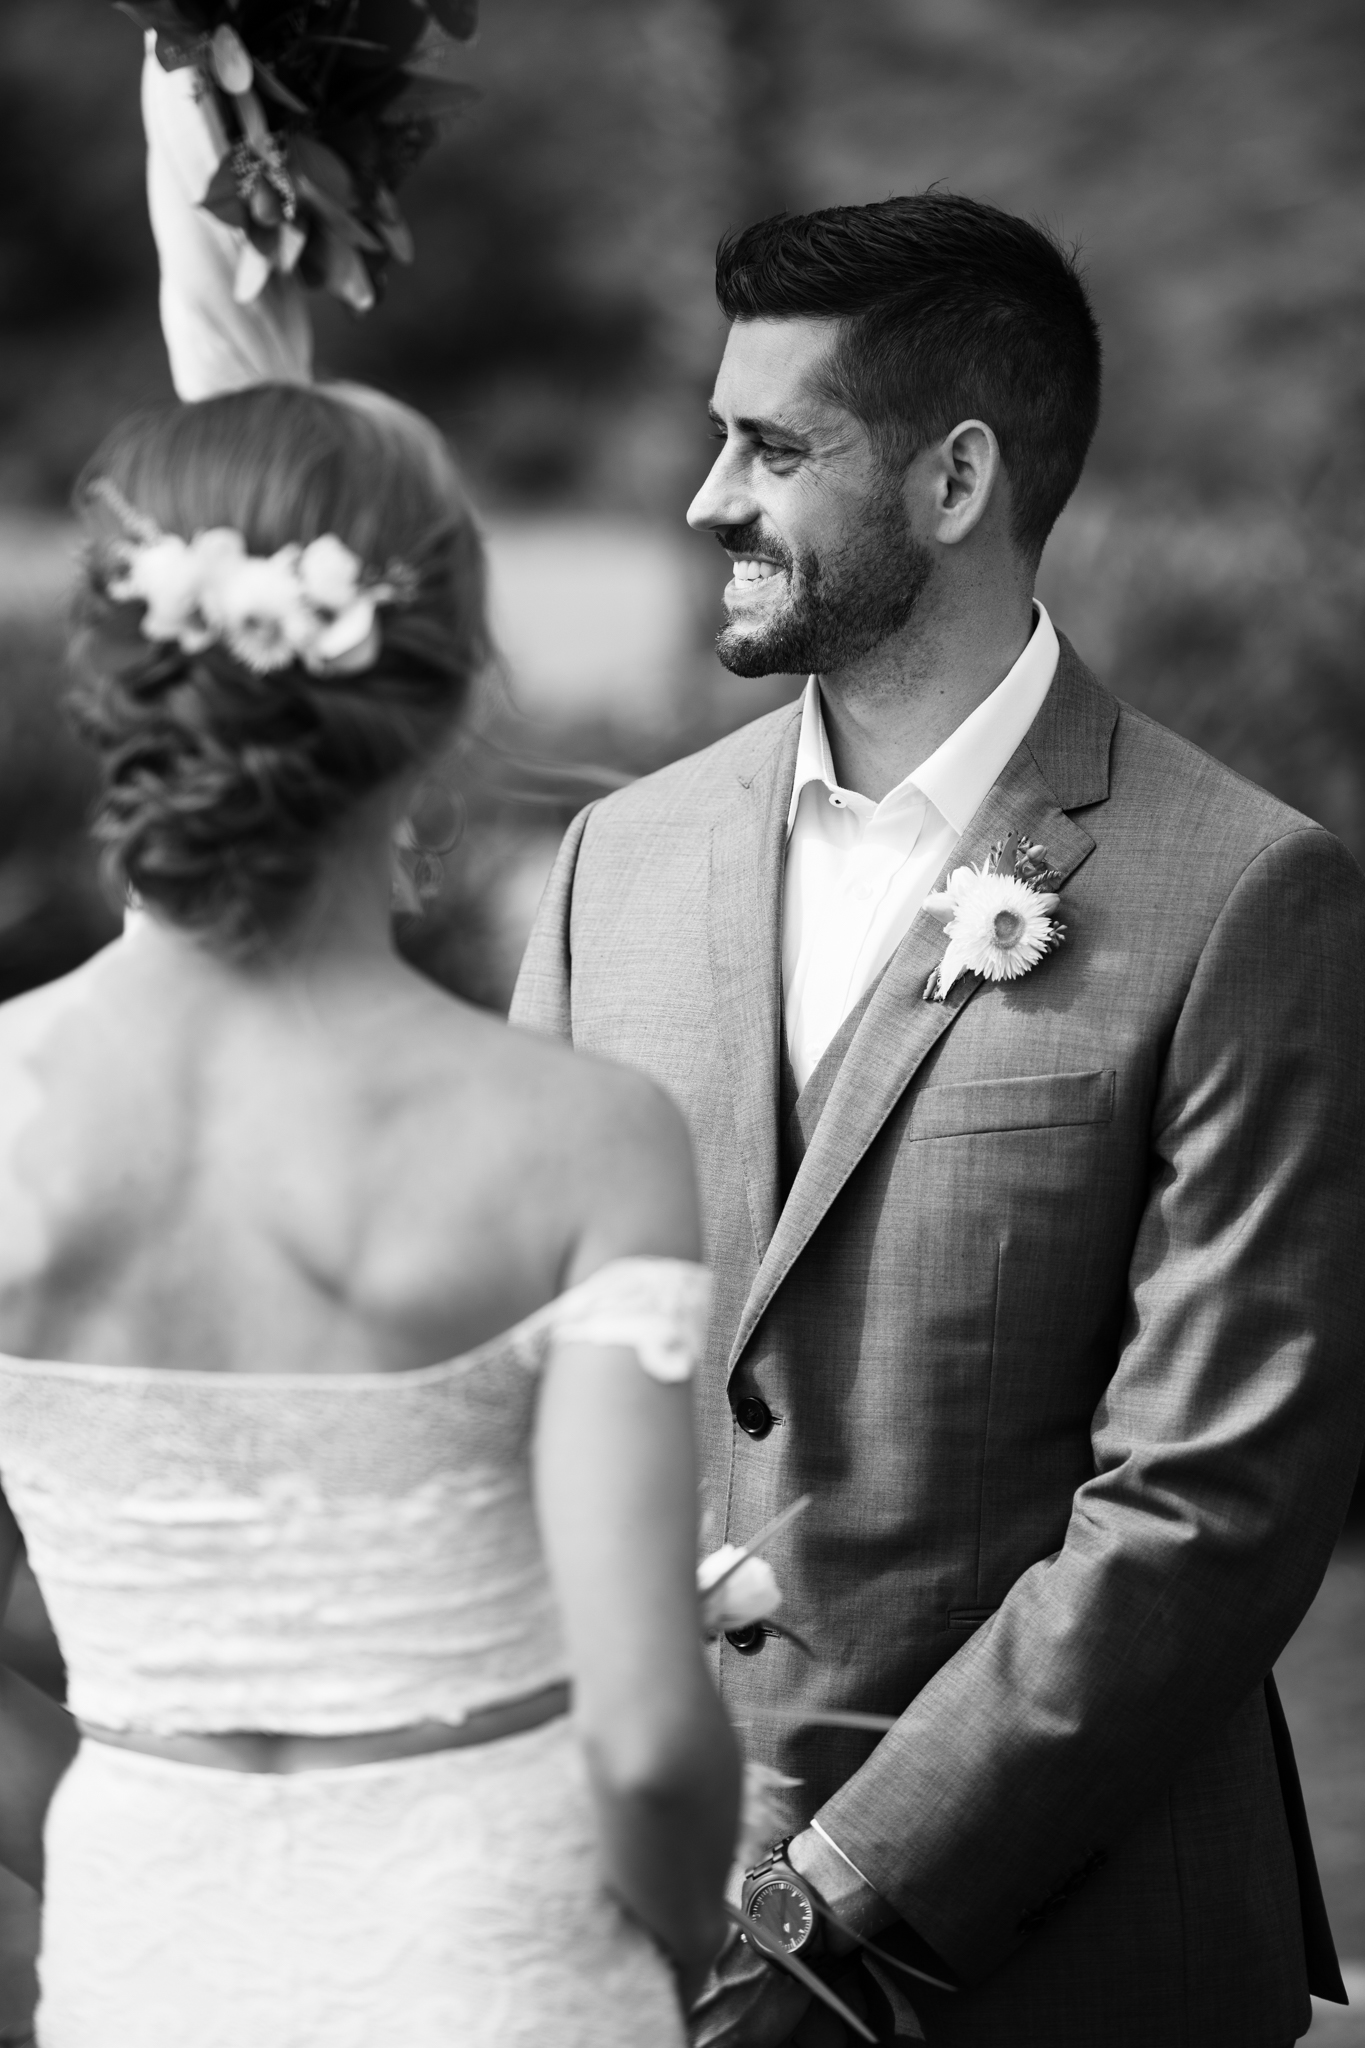 29_PRVW_Jenny_Ken_Wedding_Trevor_Hooper_Photo.jpg